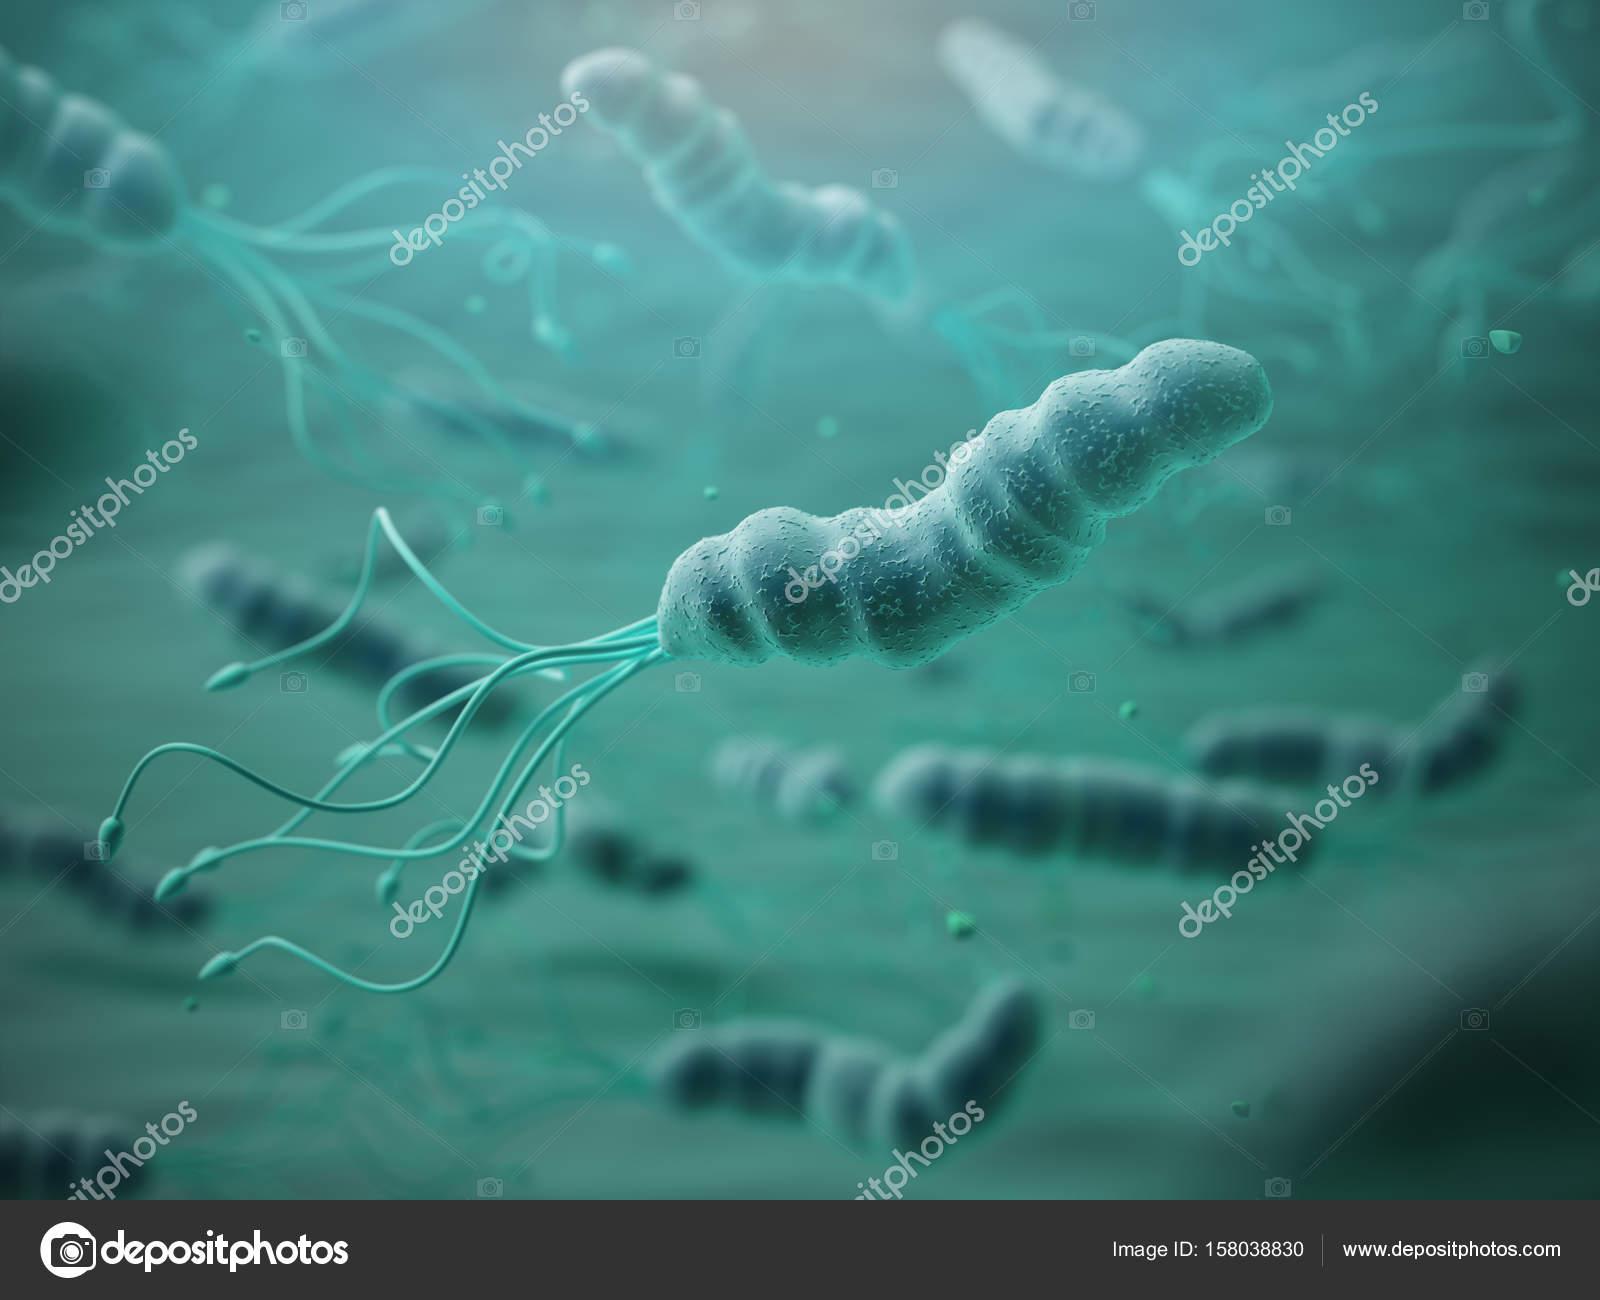 Helicobacter pylori - Wikipedia